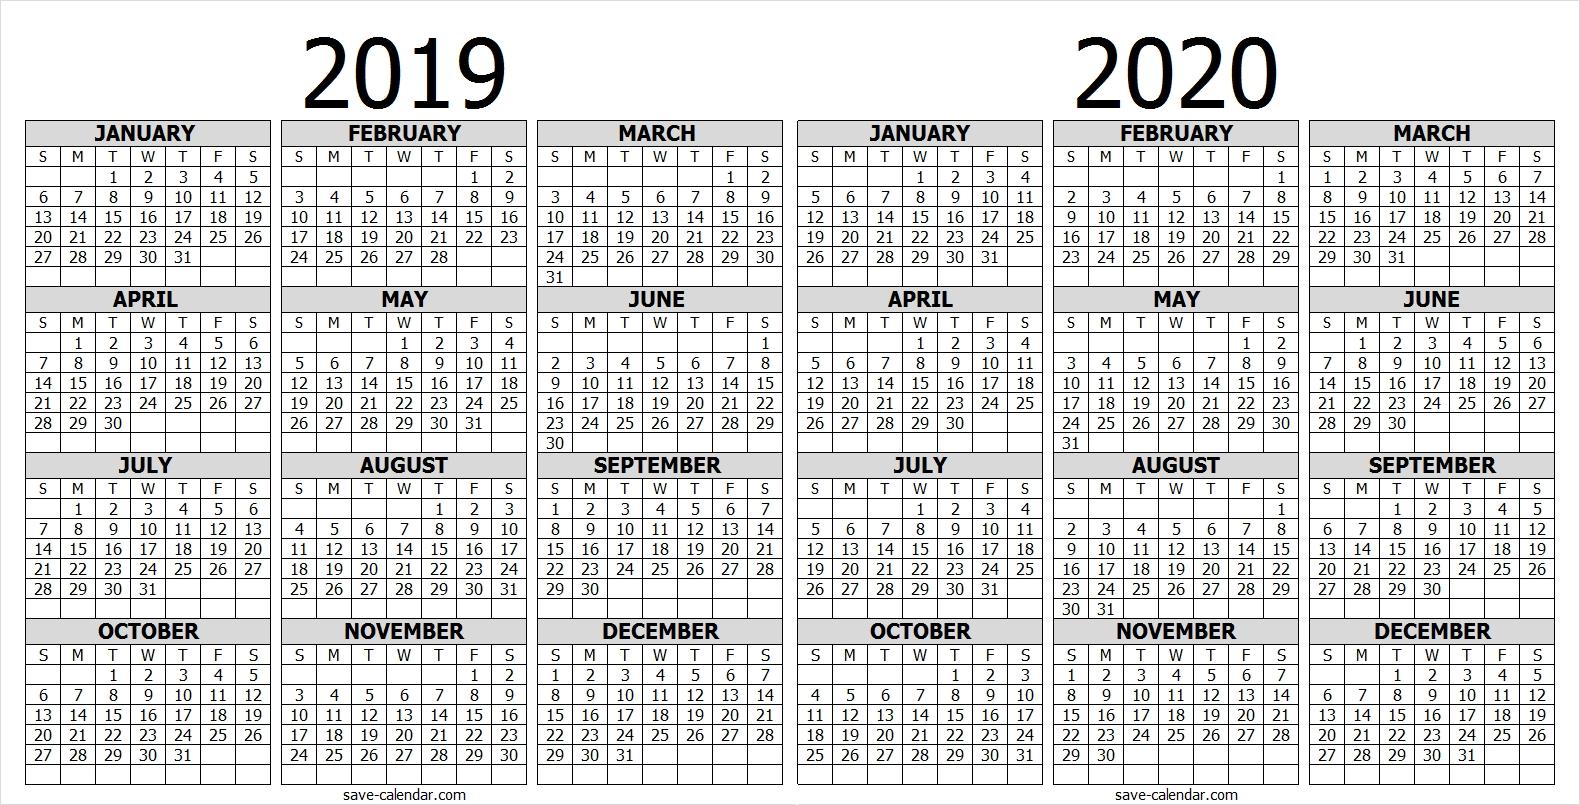 Calendar 2019 2020 One Page   2019 Calendar   Free Calendar for Printable Fill In Calendar 2019 - 2020